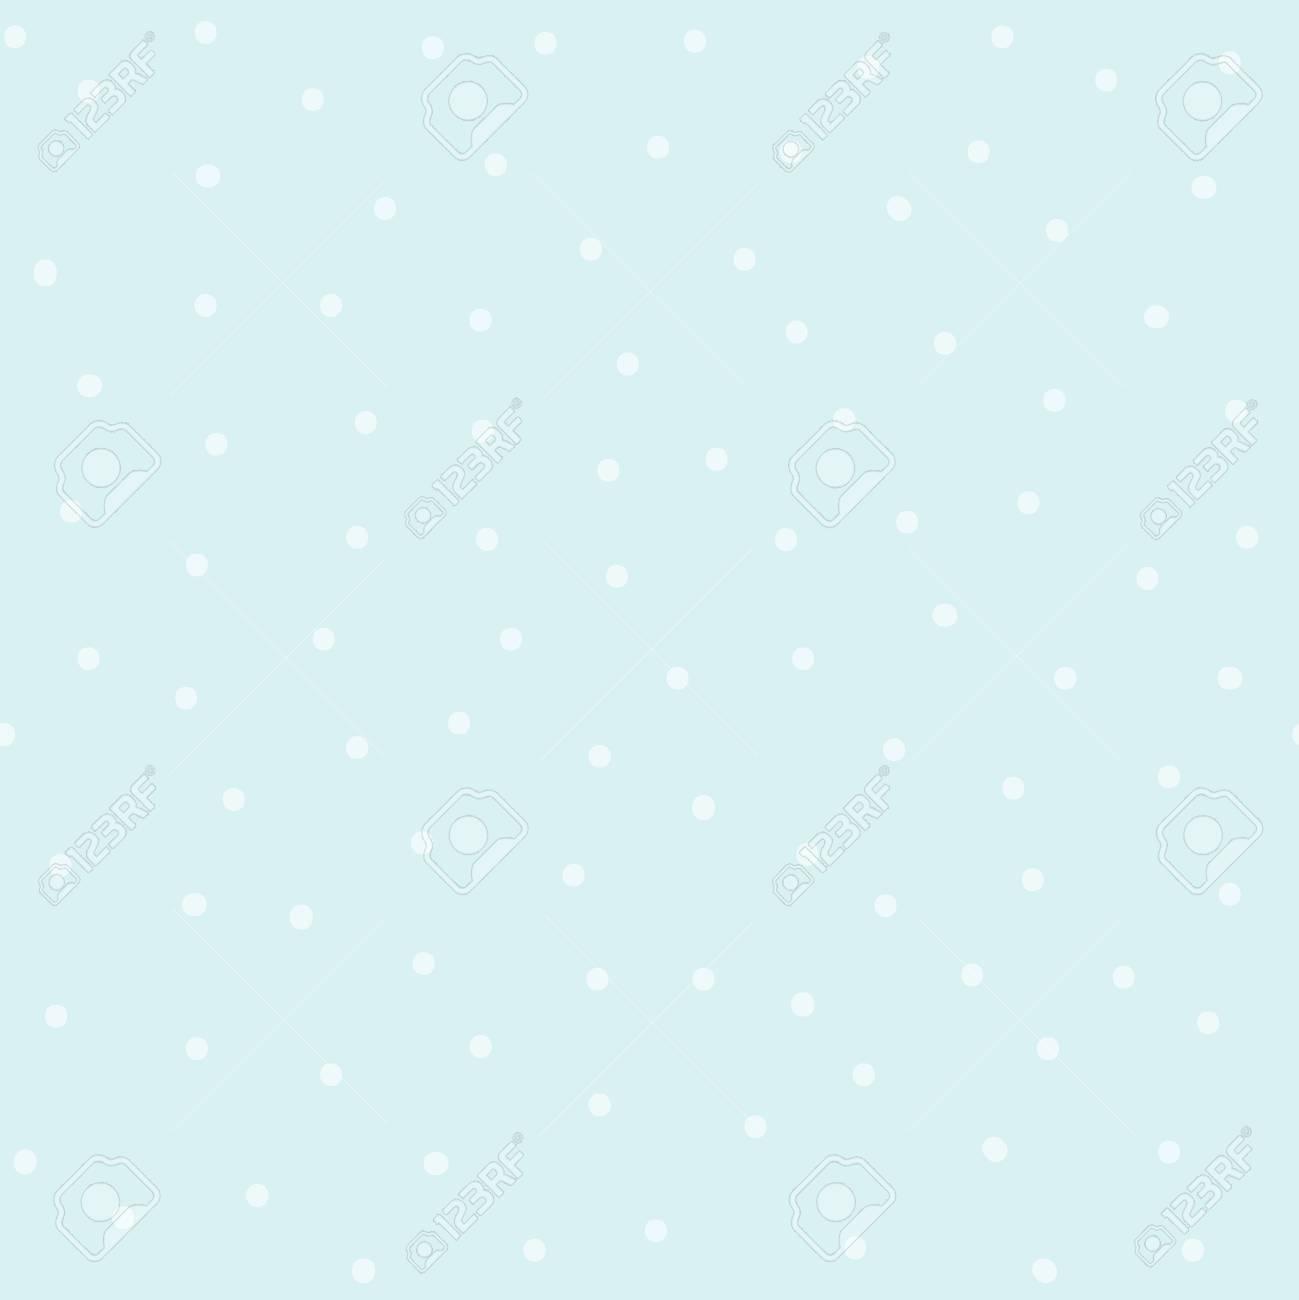 Seamless blue polka dot pattern vector - 126250666